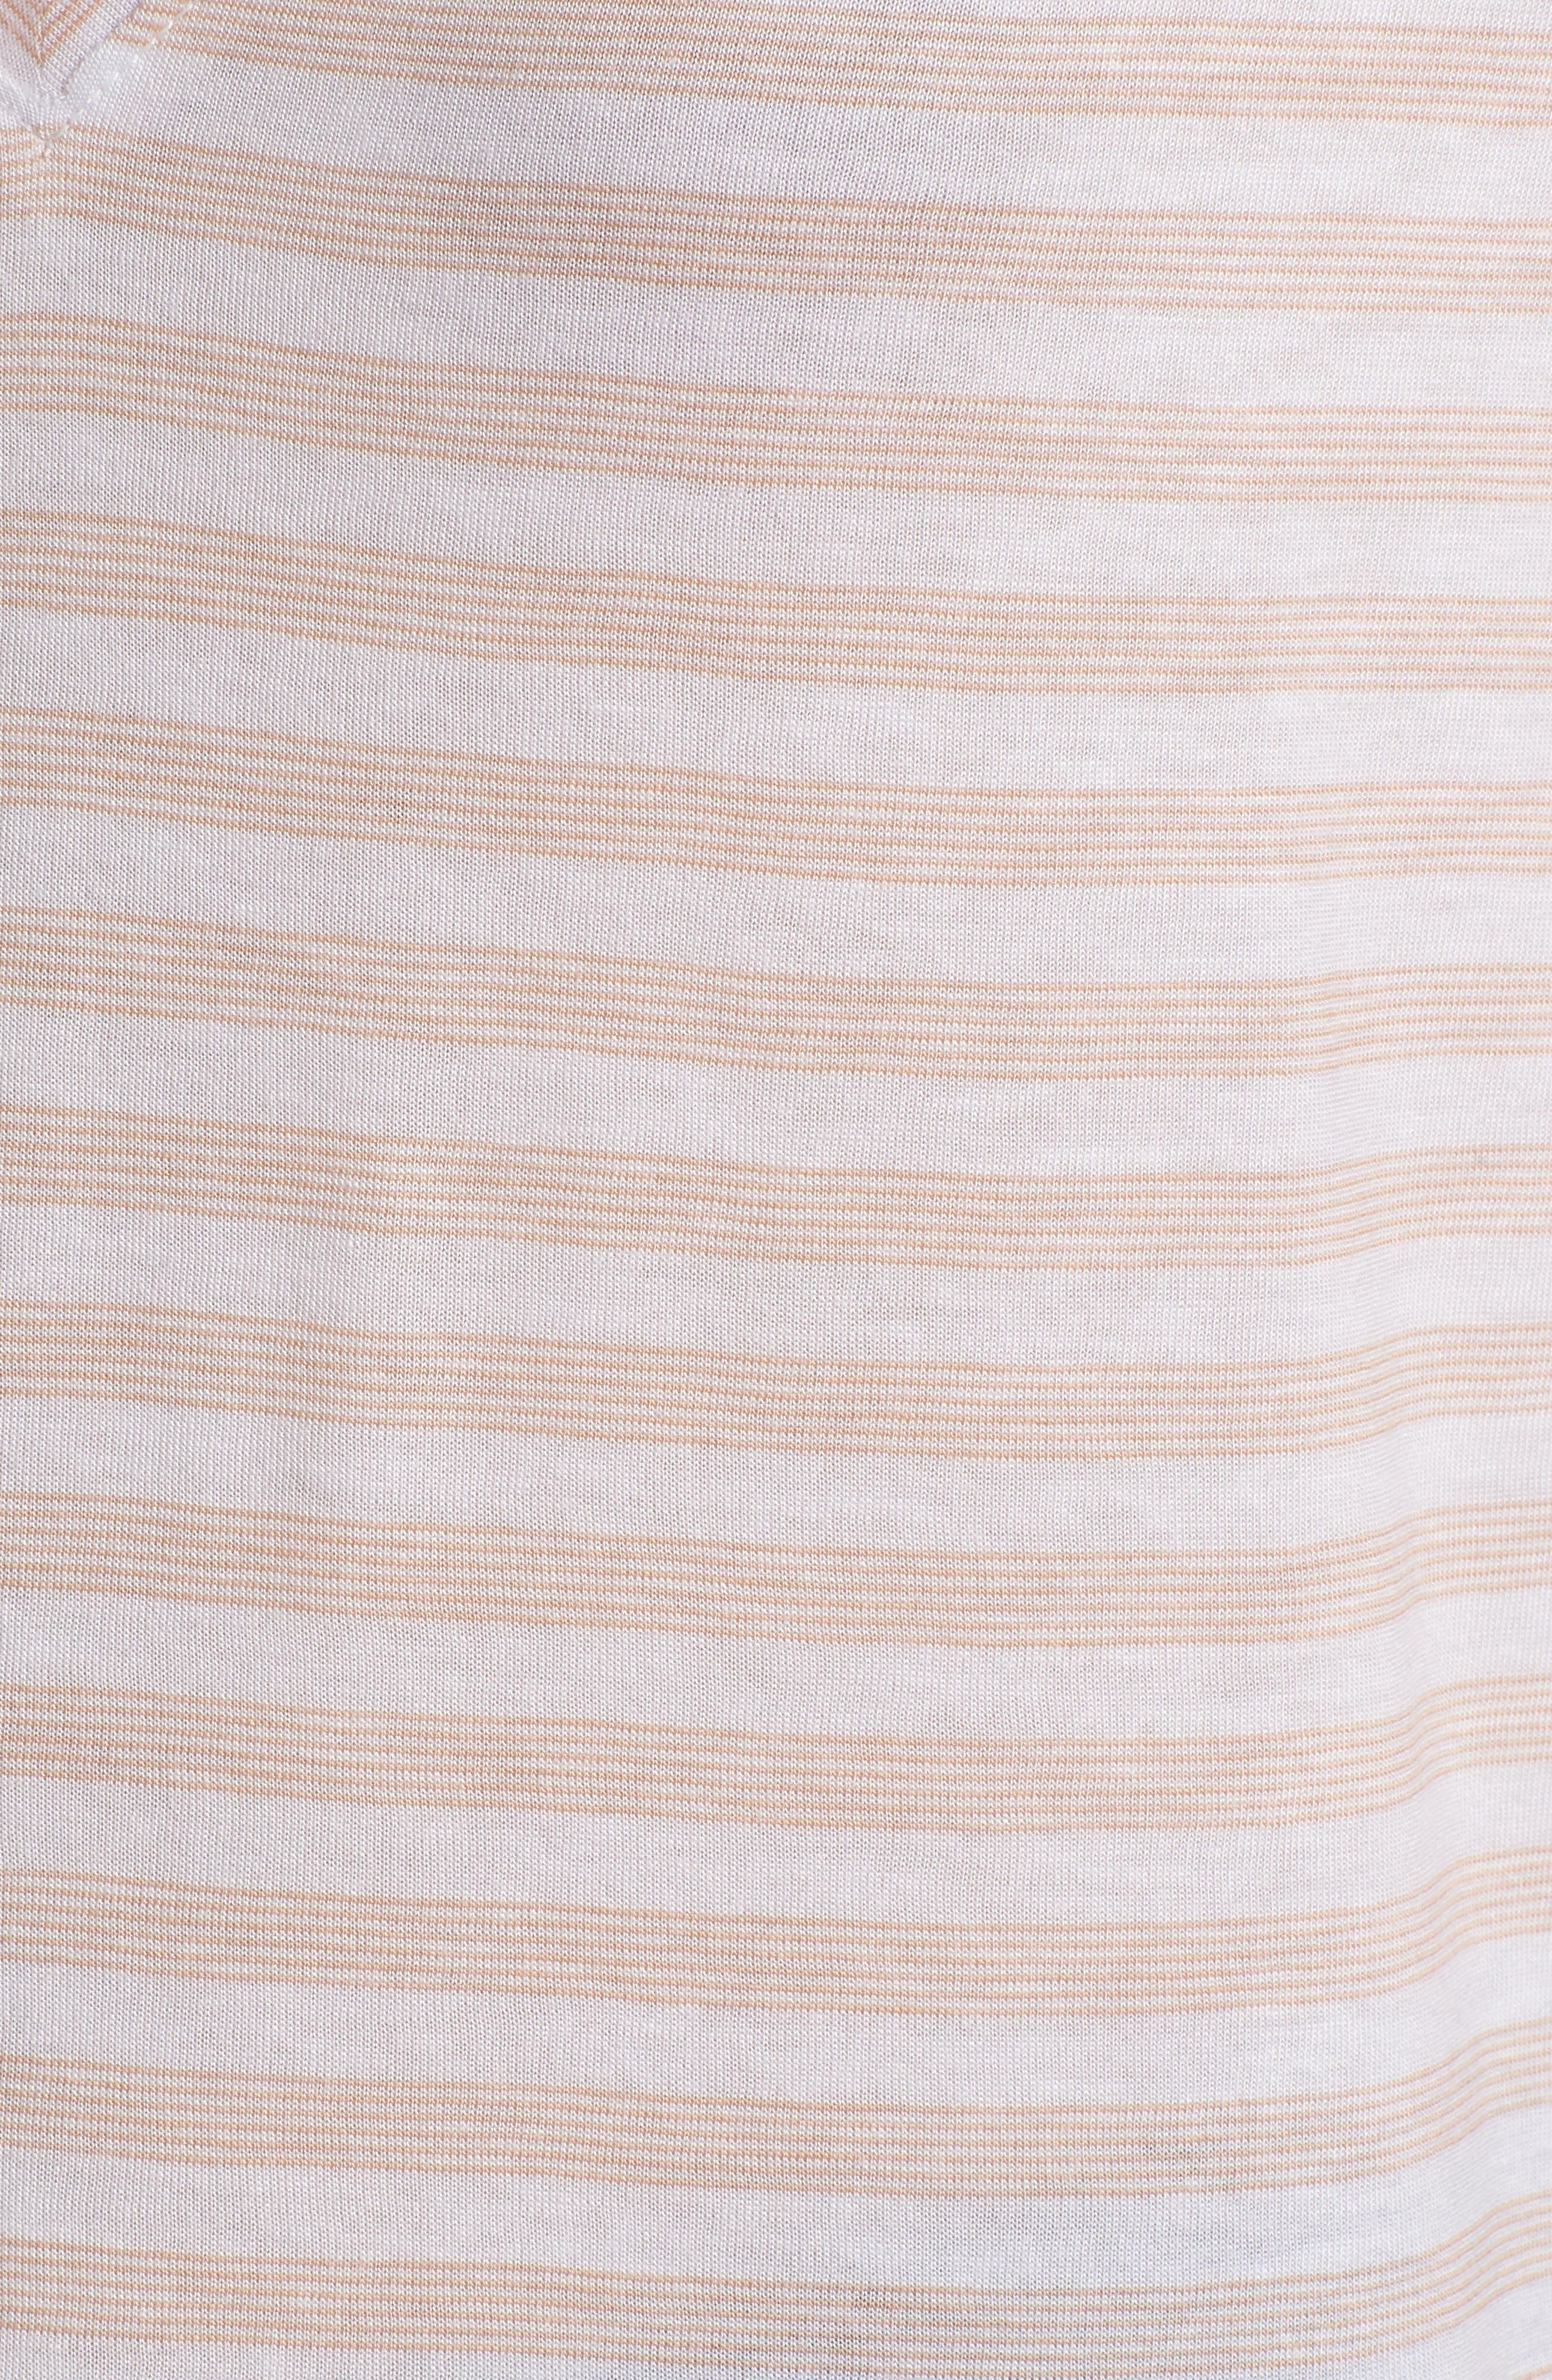 Ruffle Trim Tee,                             Alternate thumbnail 6, color,                             Beige Maple Ripple Stripe